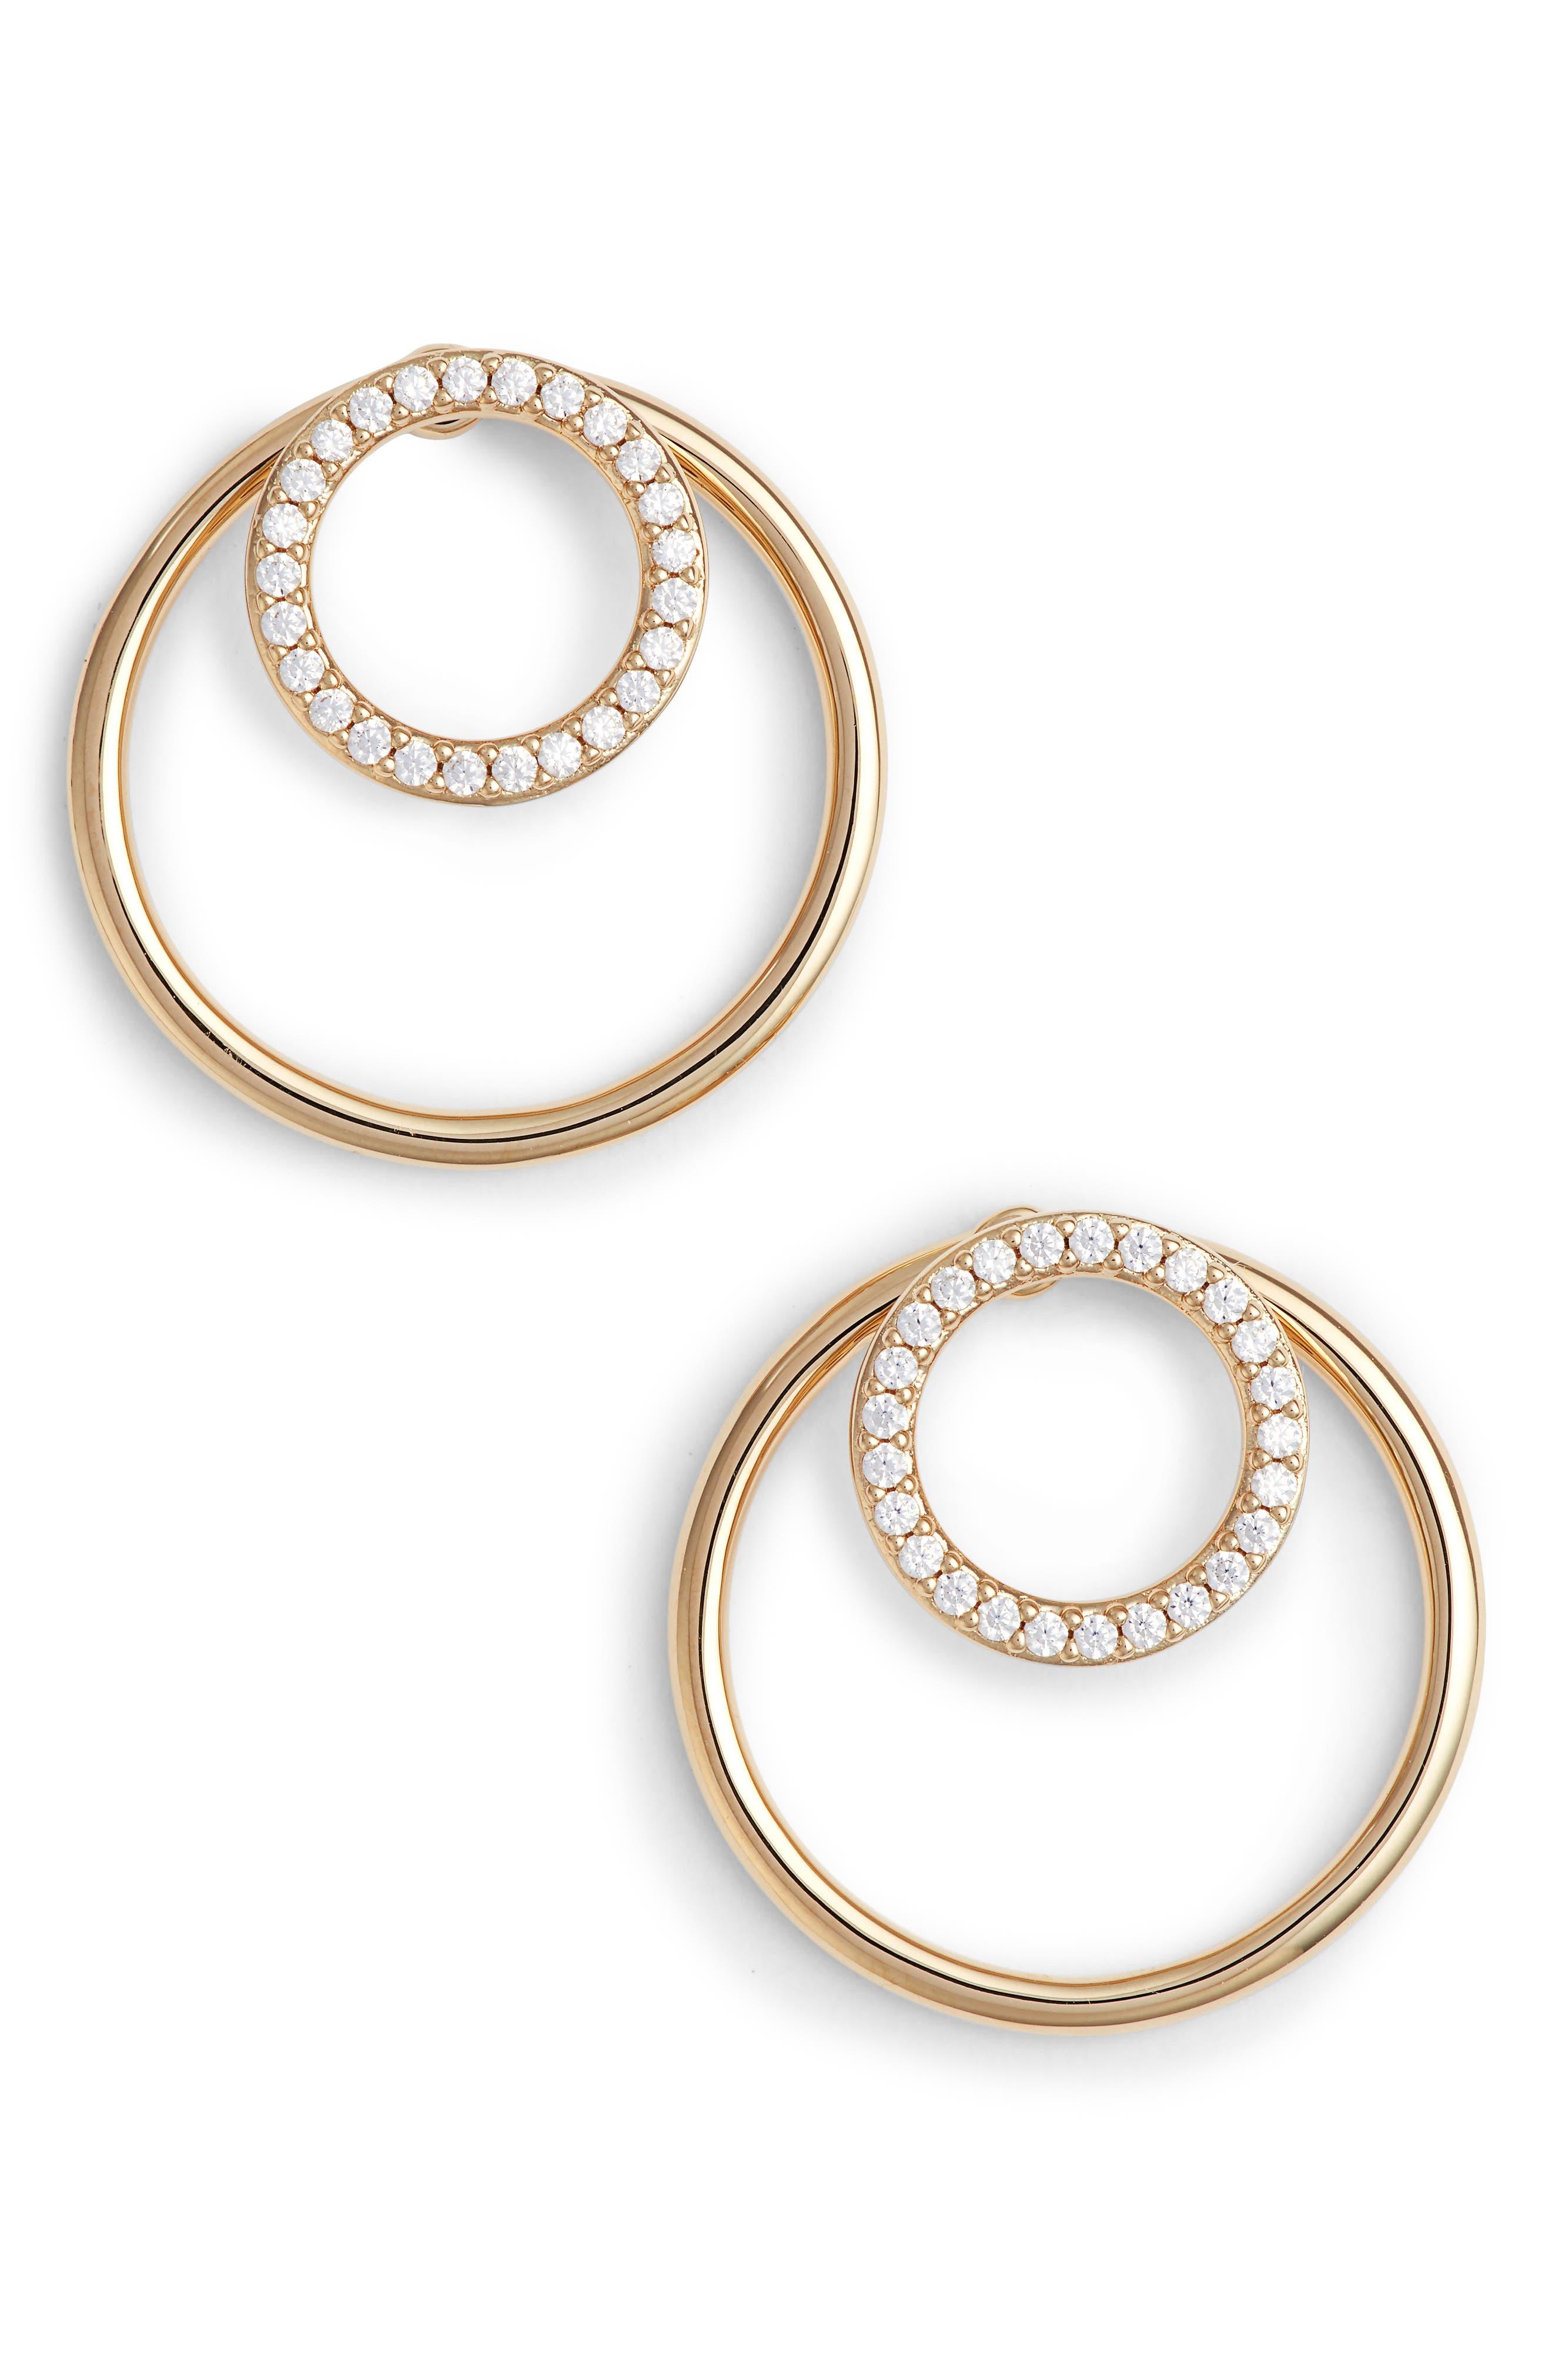 Pavé Double Circle Earrings,                             Main thumbnail 1, color,                             Gold/ Clear